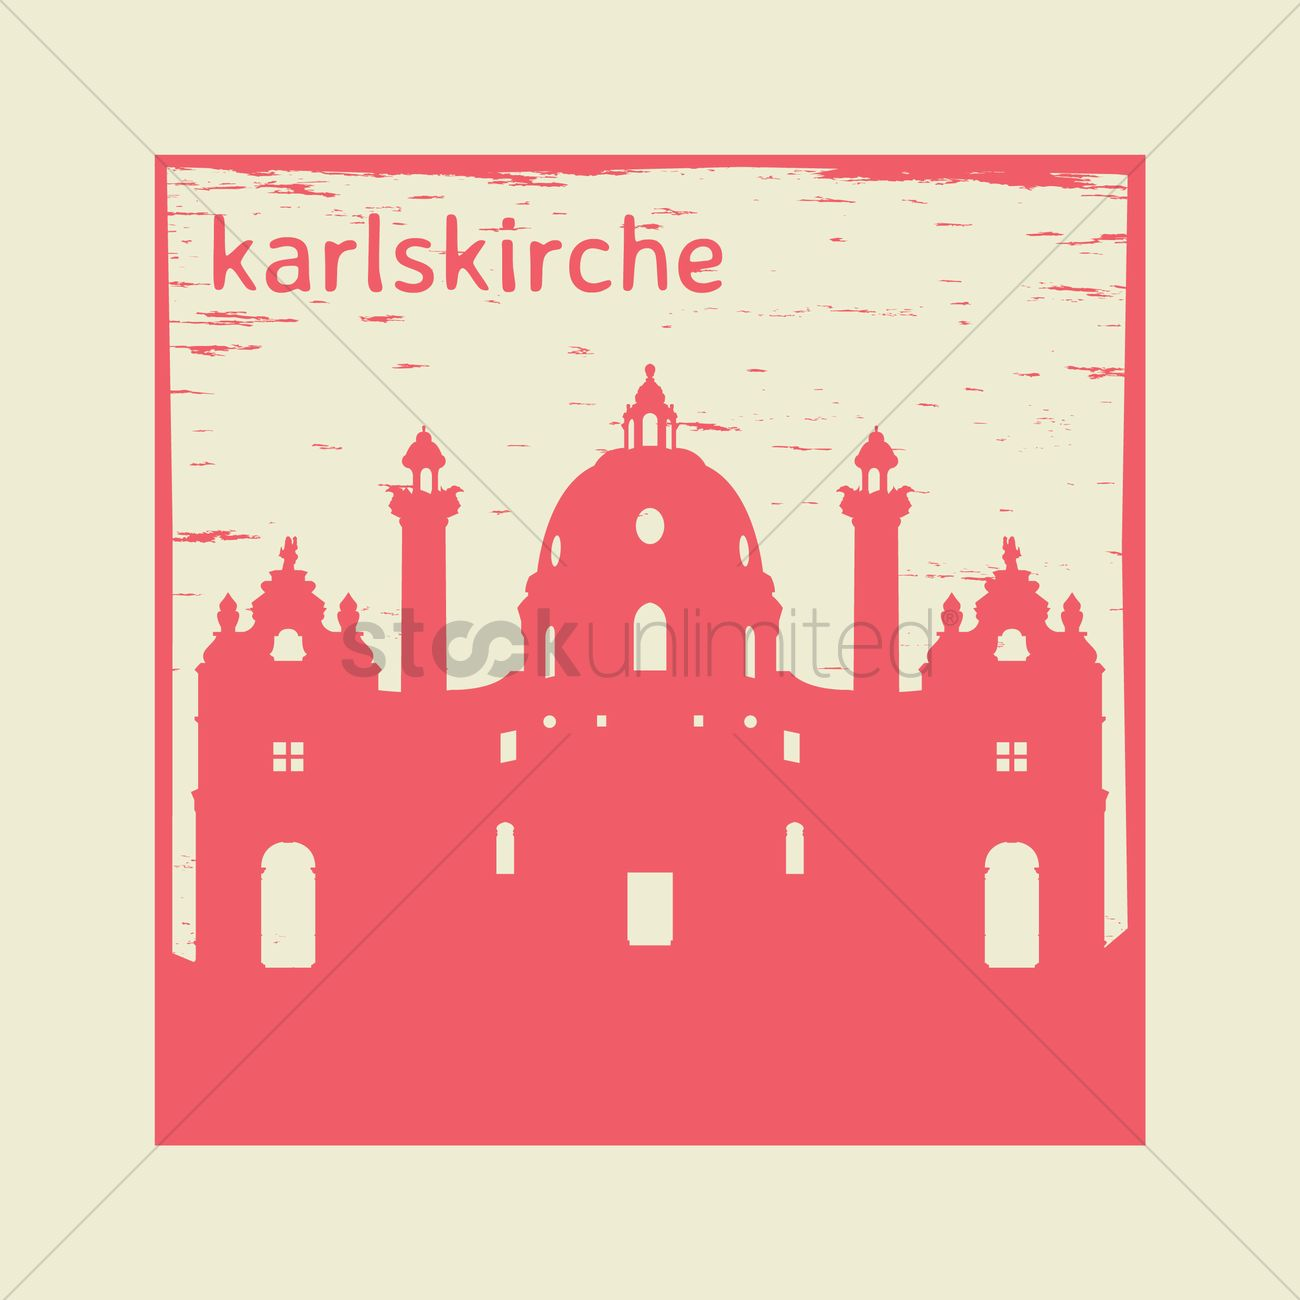 Karlskirche rubber stamp Vector Image.